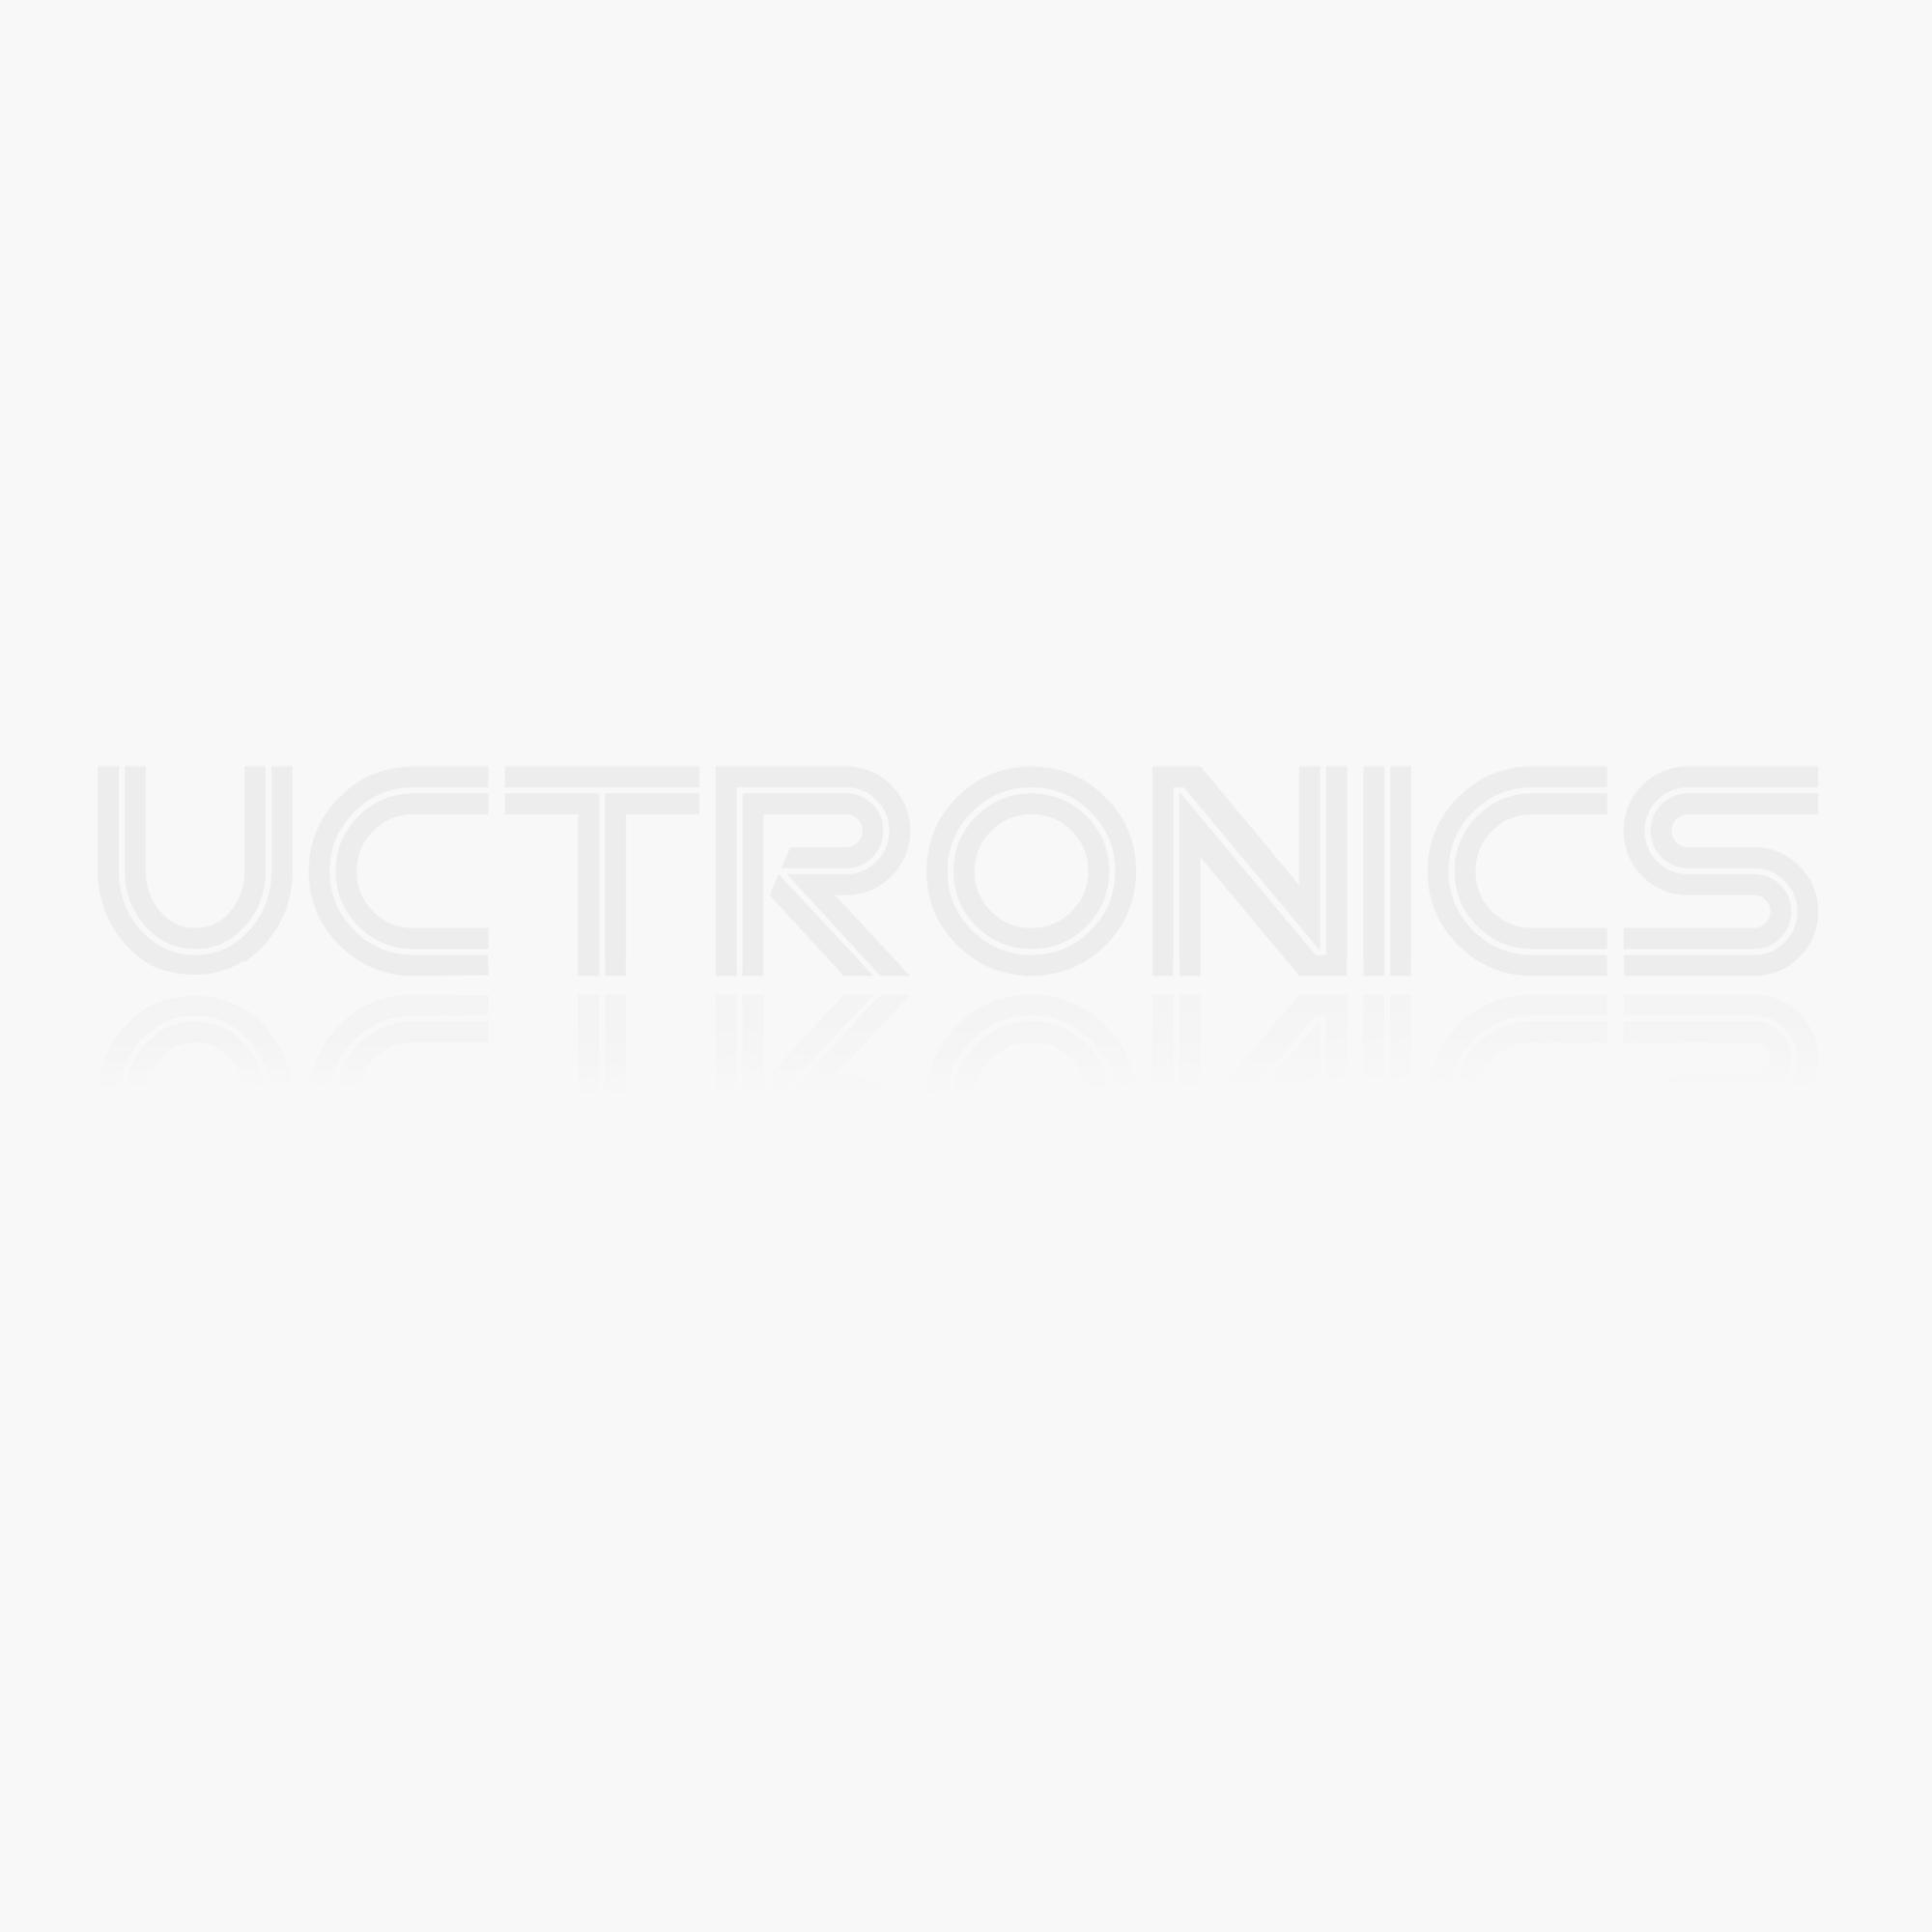 100pcs 4x6cm Plastic Zip Lock Ziplock Clear Transparent Resealable Bag #0